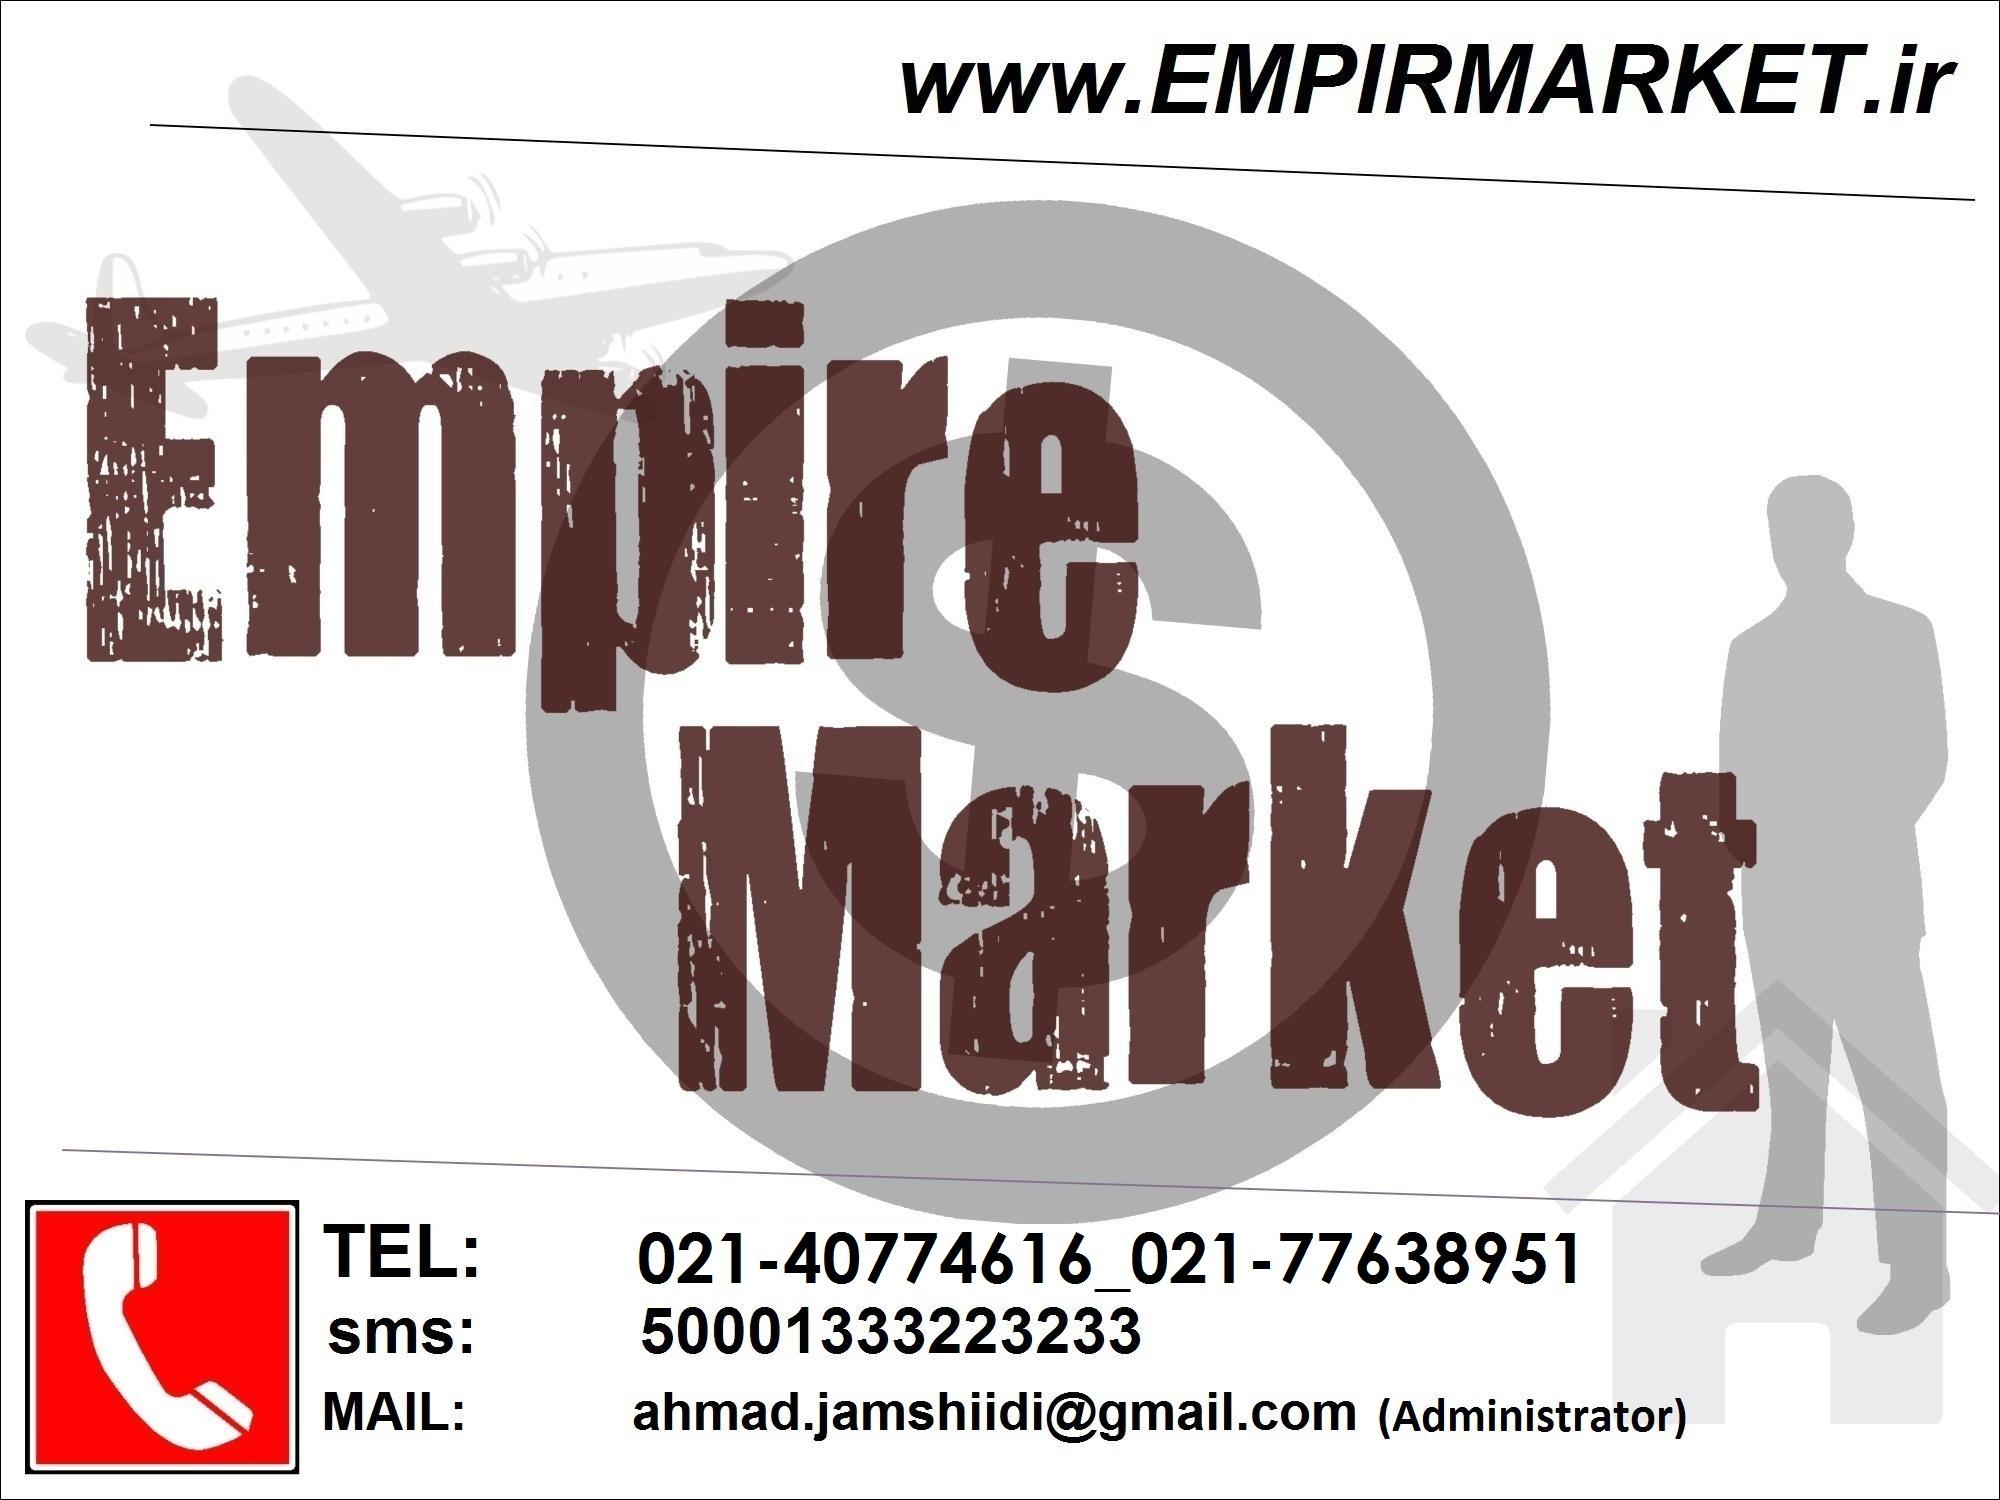 www.empirmarket.ir_-_empire_market_-_iran_فروشگاه_الکترونیک_ام__پایر_مارکت